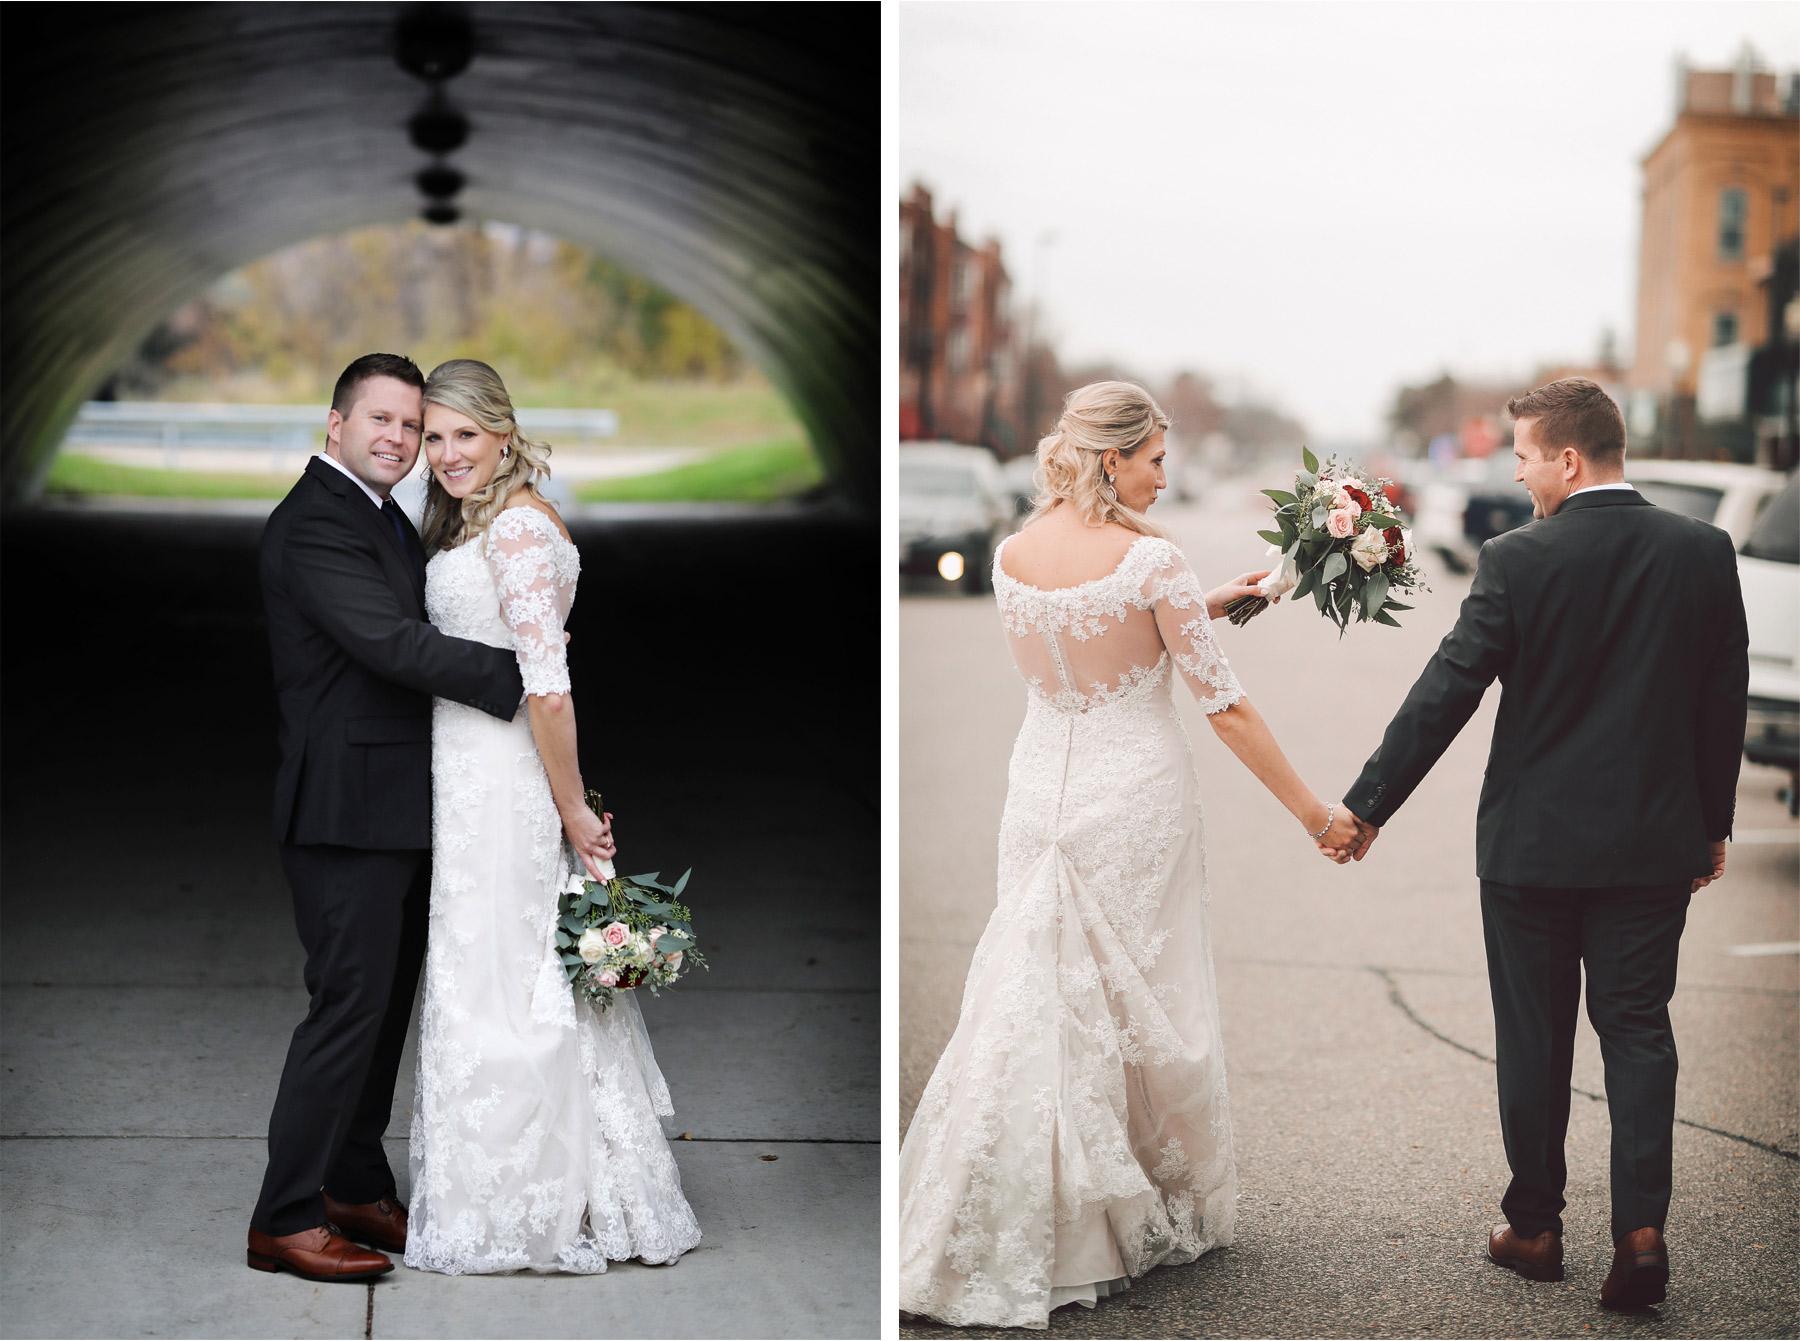 09-Shakopee-Minnesota-Wedding-Photography-by-Vick-Photography-Amber-and-Justin.jpg